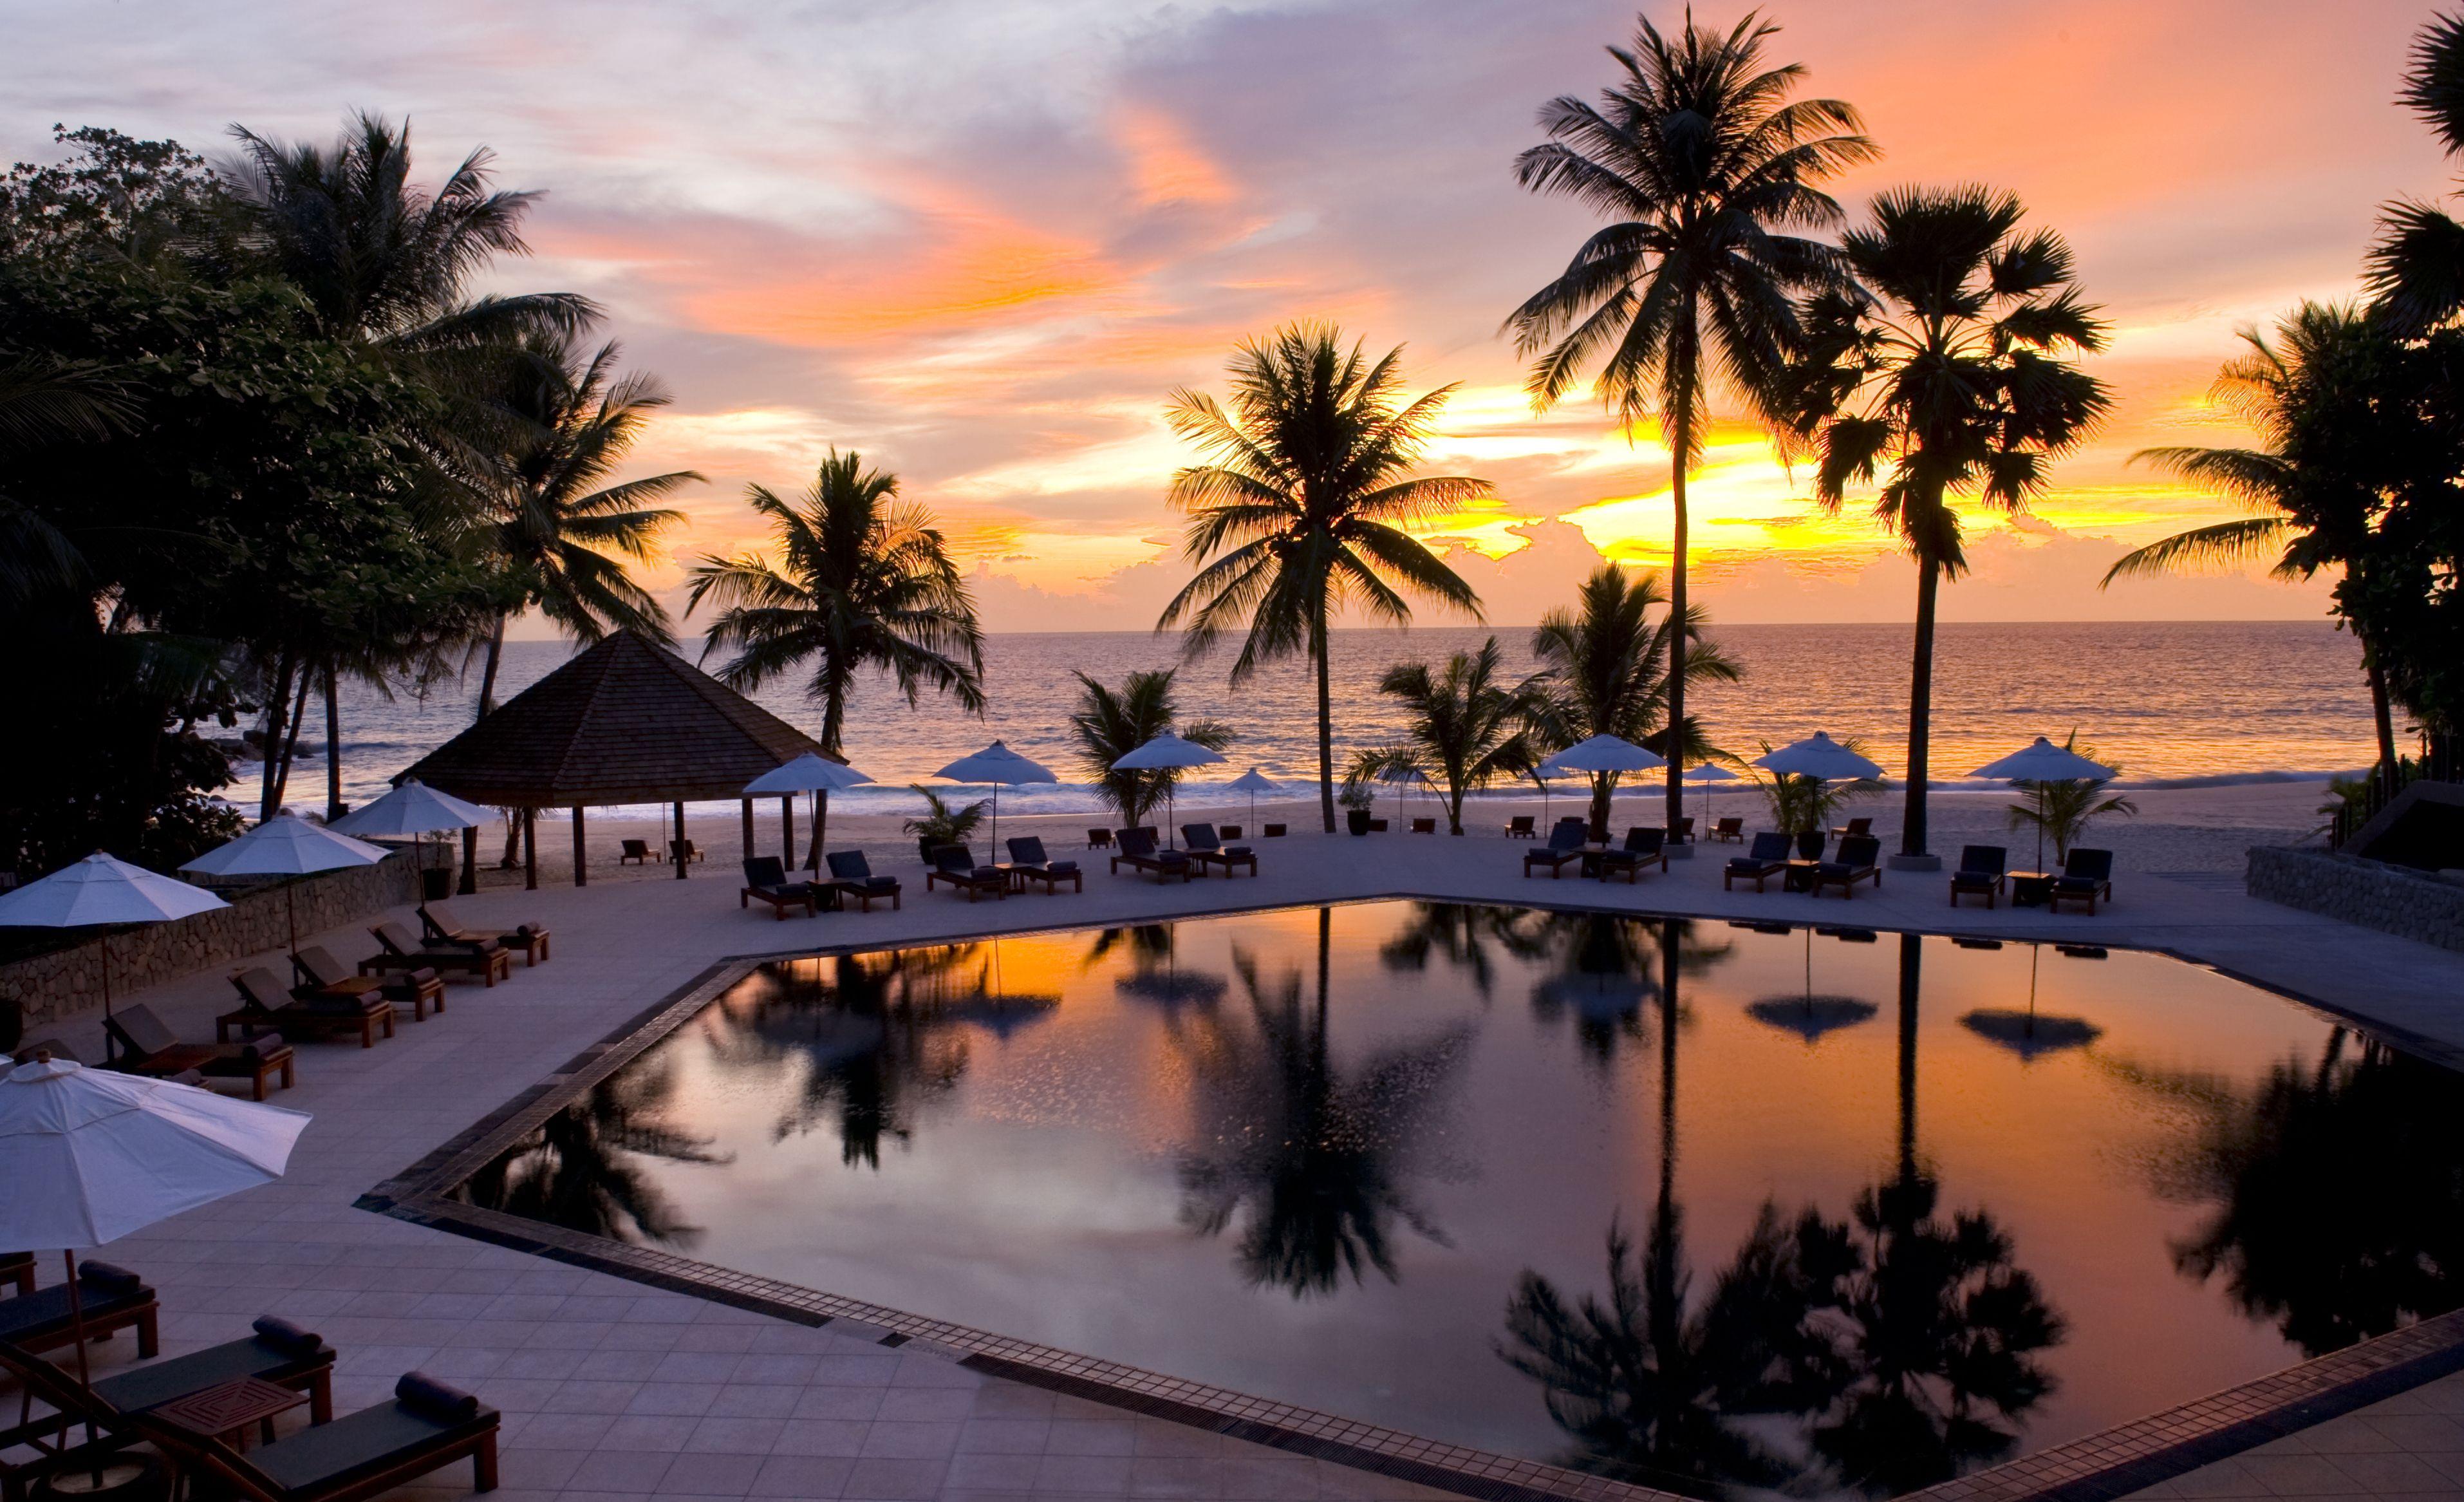 Sunset At The Surin Sunset Pool Phuket Resort Luxury Beach Resorts Beach Resorts Phuket